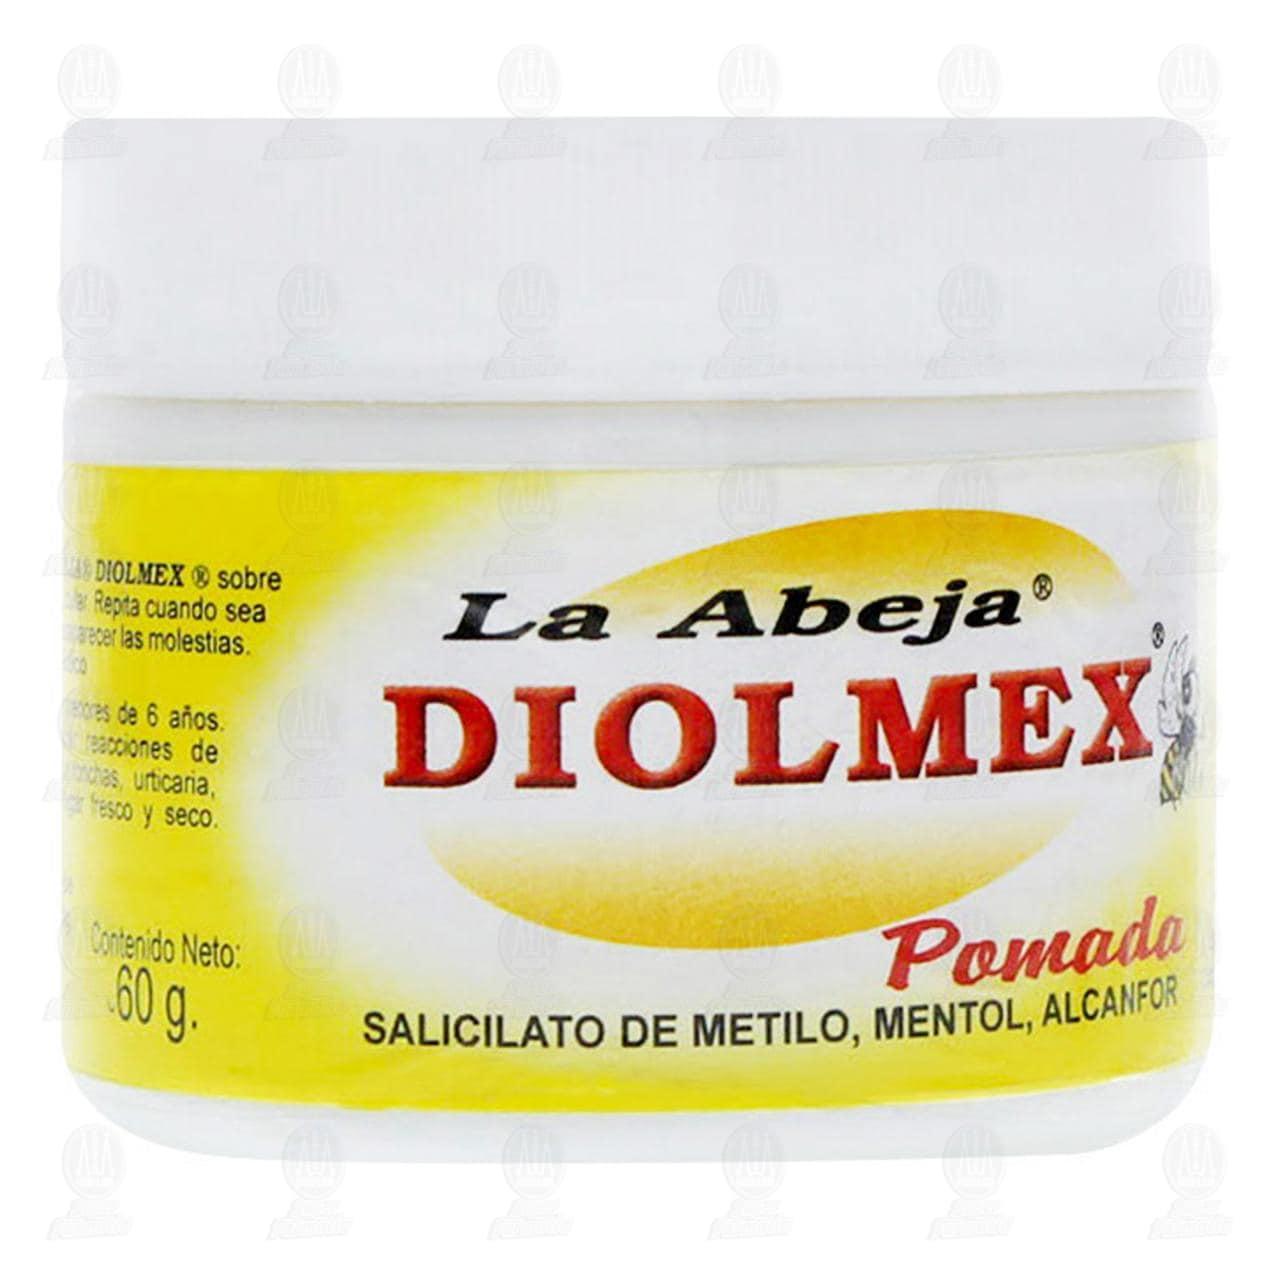 Comprar La Abeja Diolmex Pomada 60gr en Farmacias Guadalajara